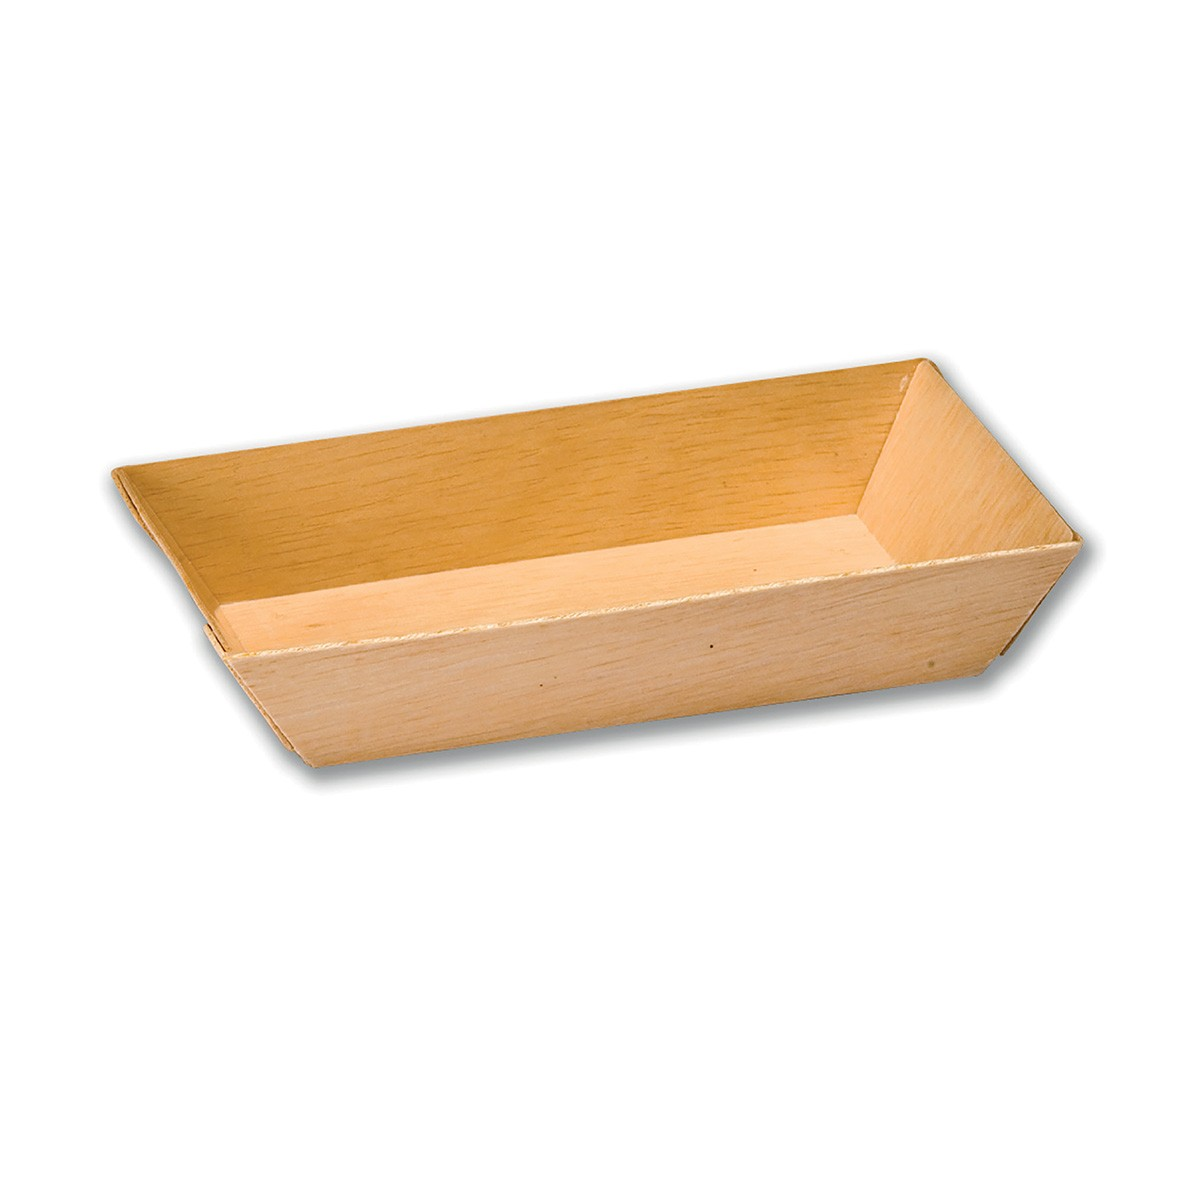 Rectangular Wooden Container 155x87x28mm | 400pcs